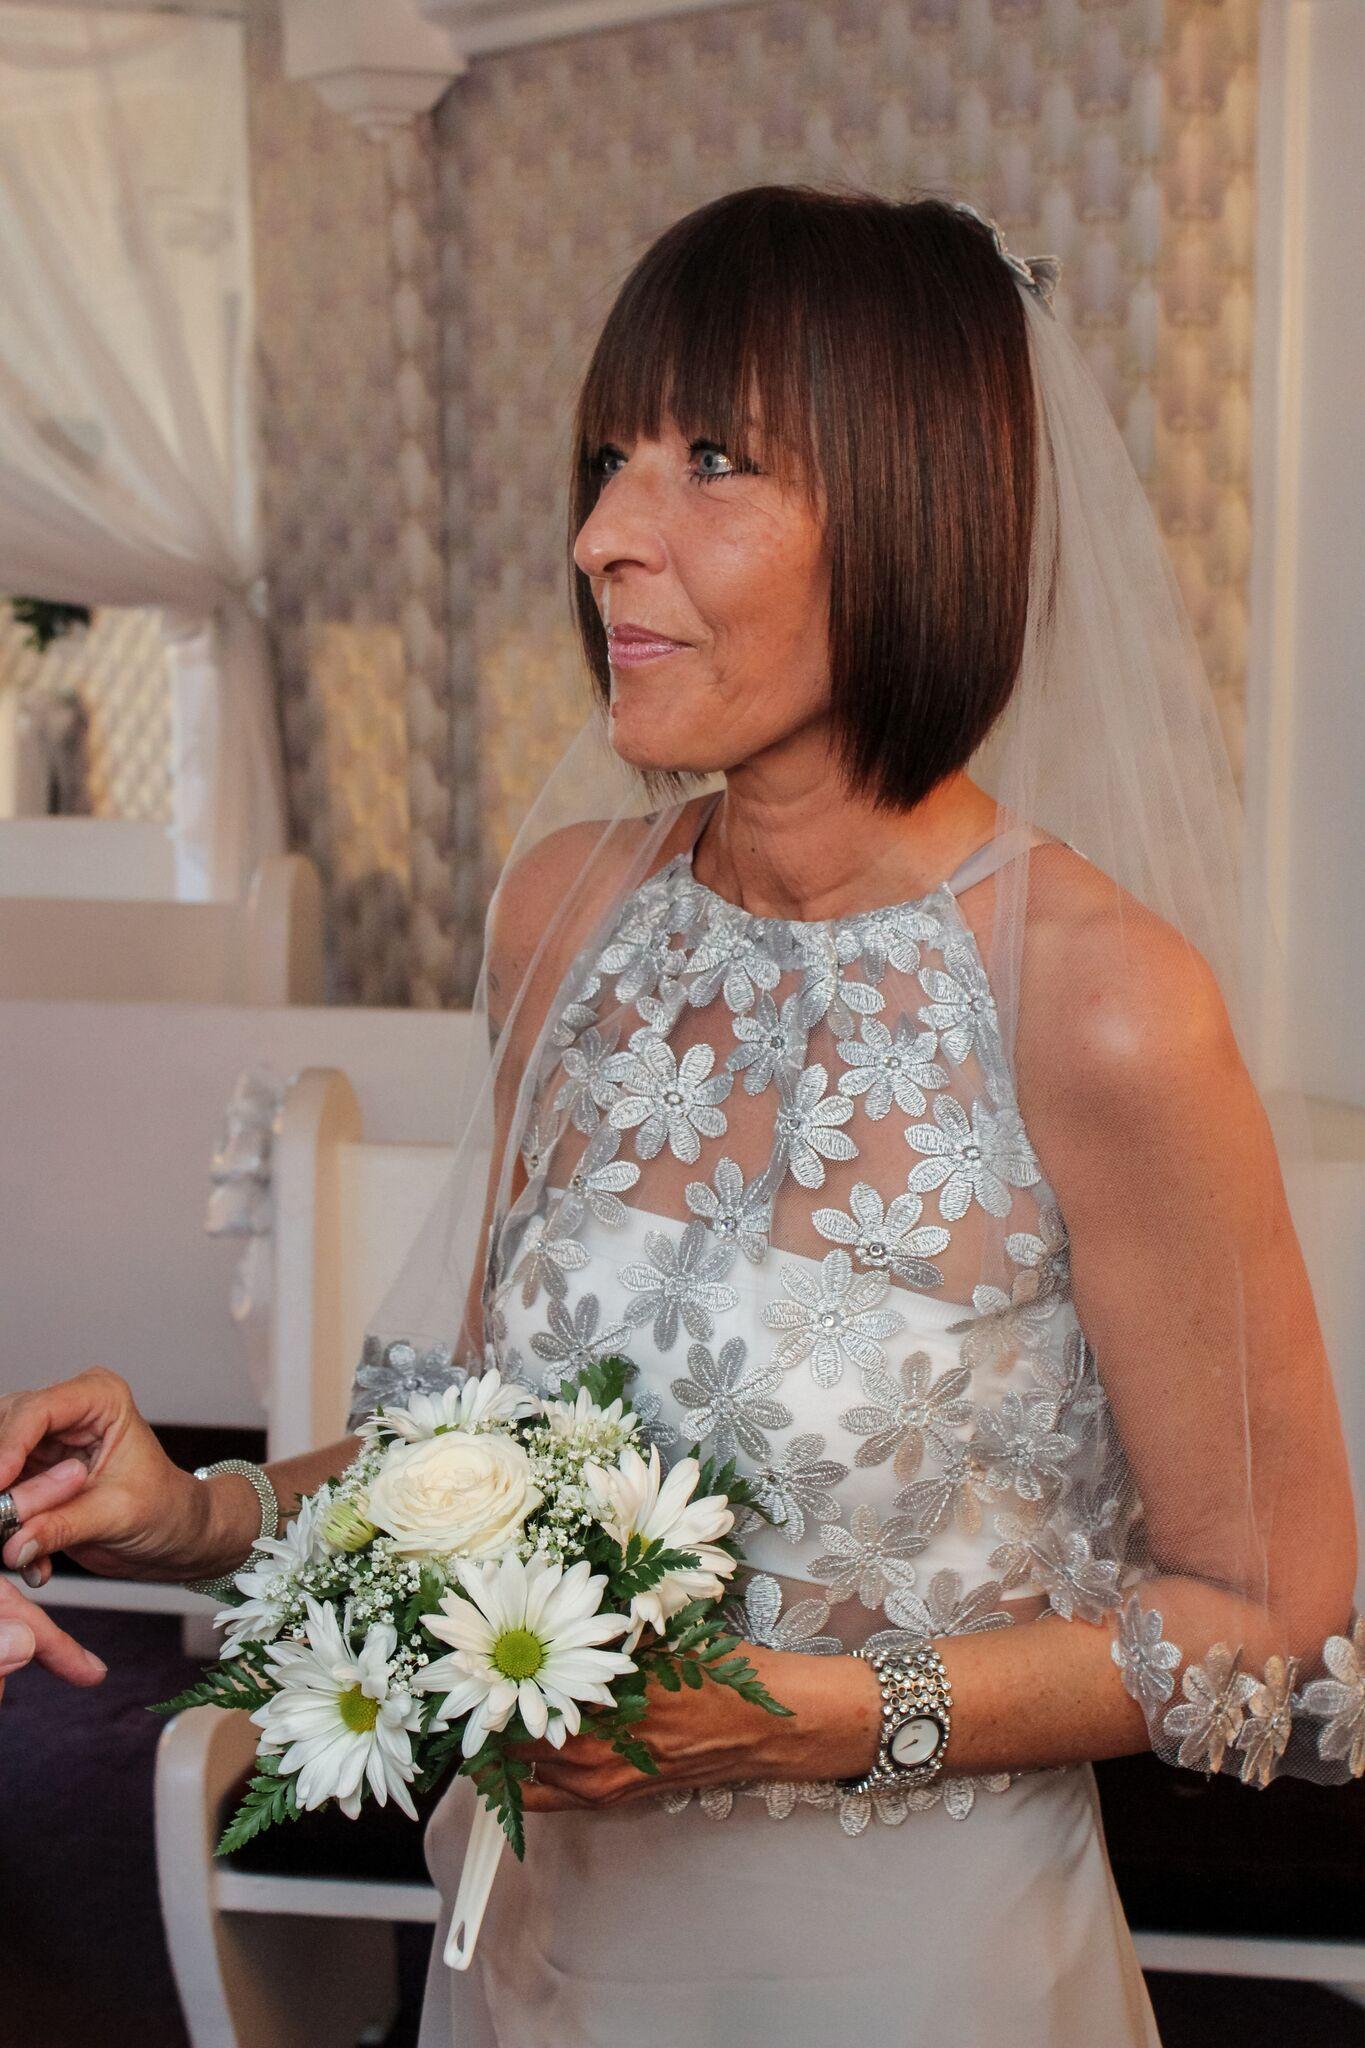 Shared with Dropbox Flower girl dresses, Wedding dresses